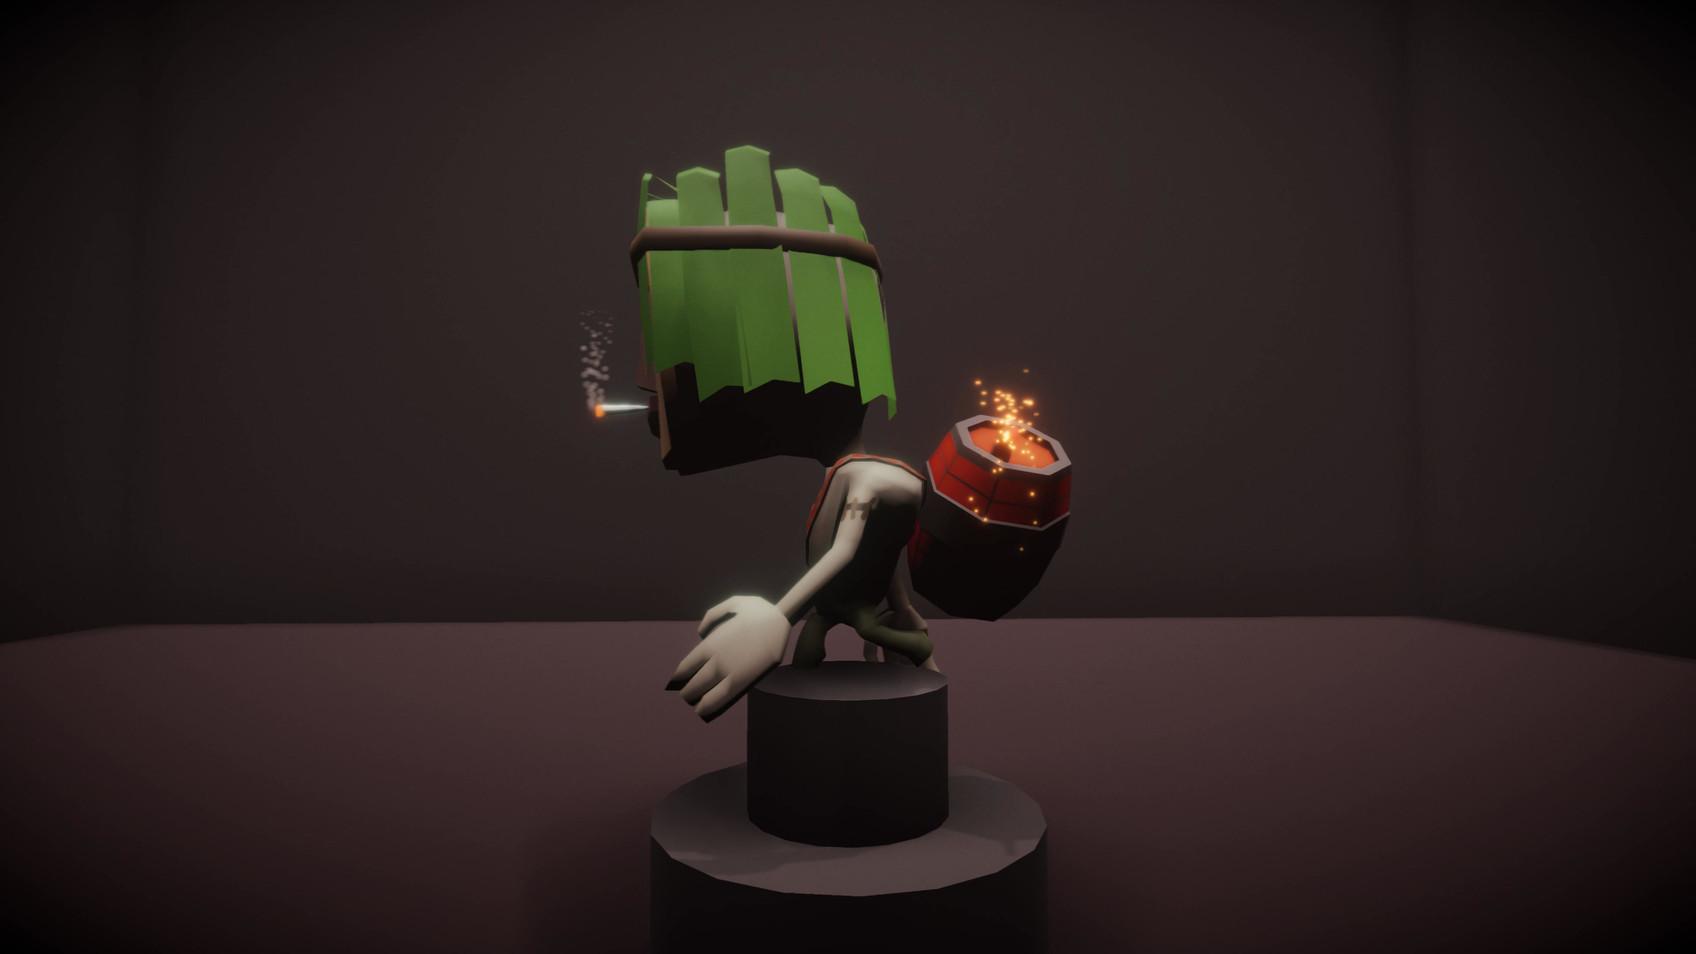 1_Bomberman.mp4